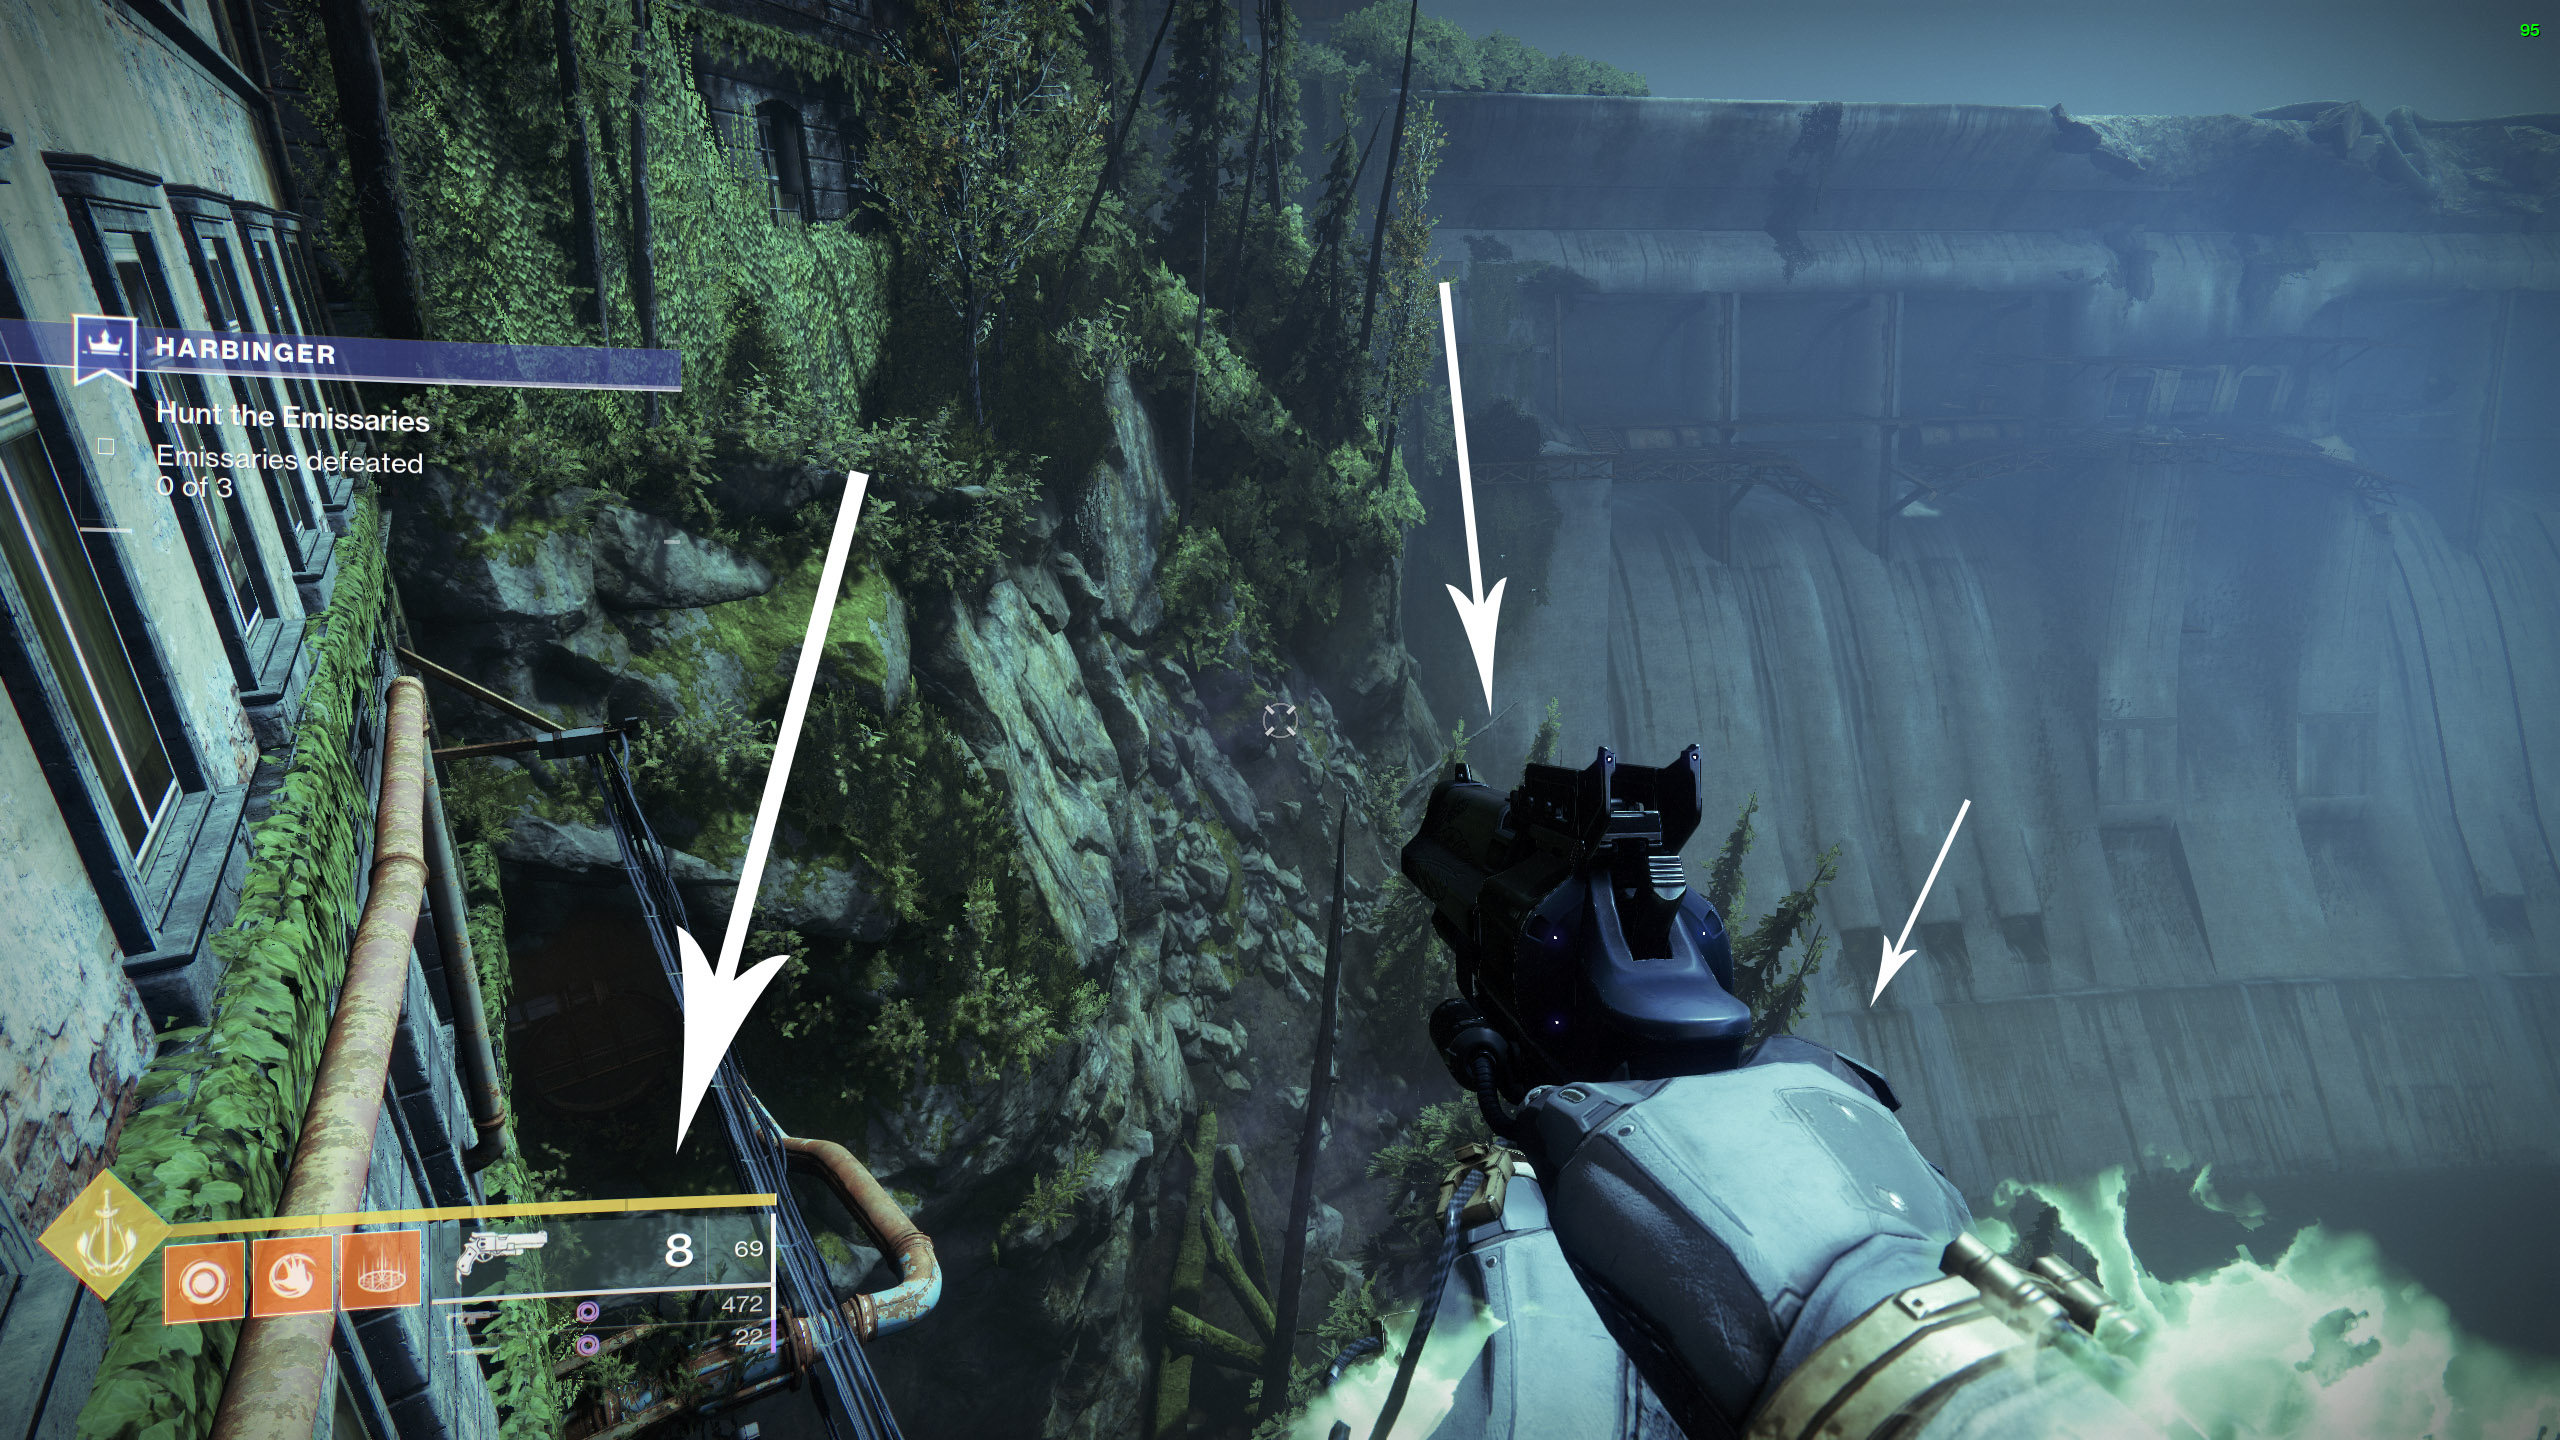 destiny 2 harbinger jumping puzzle